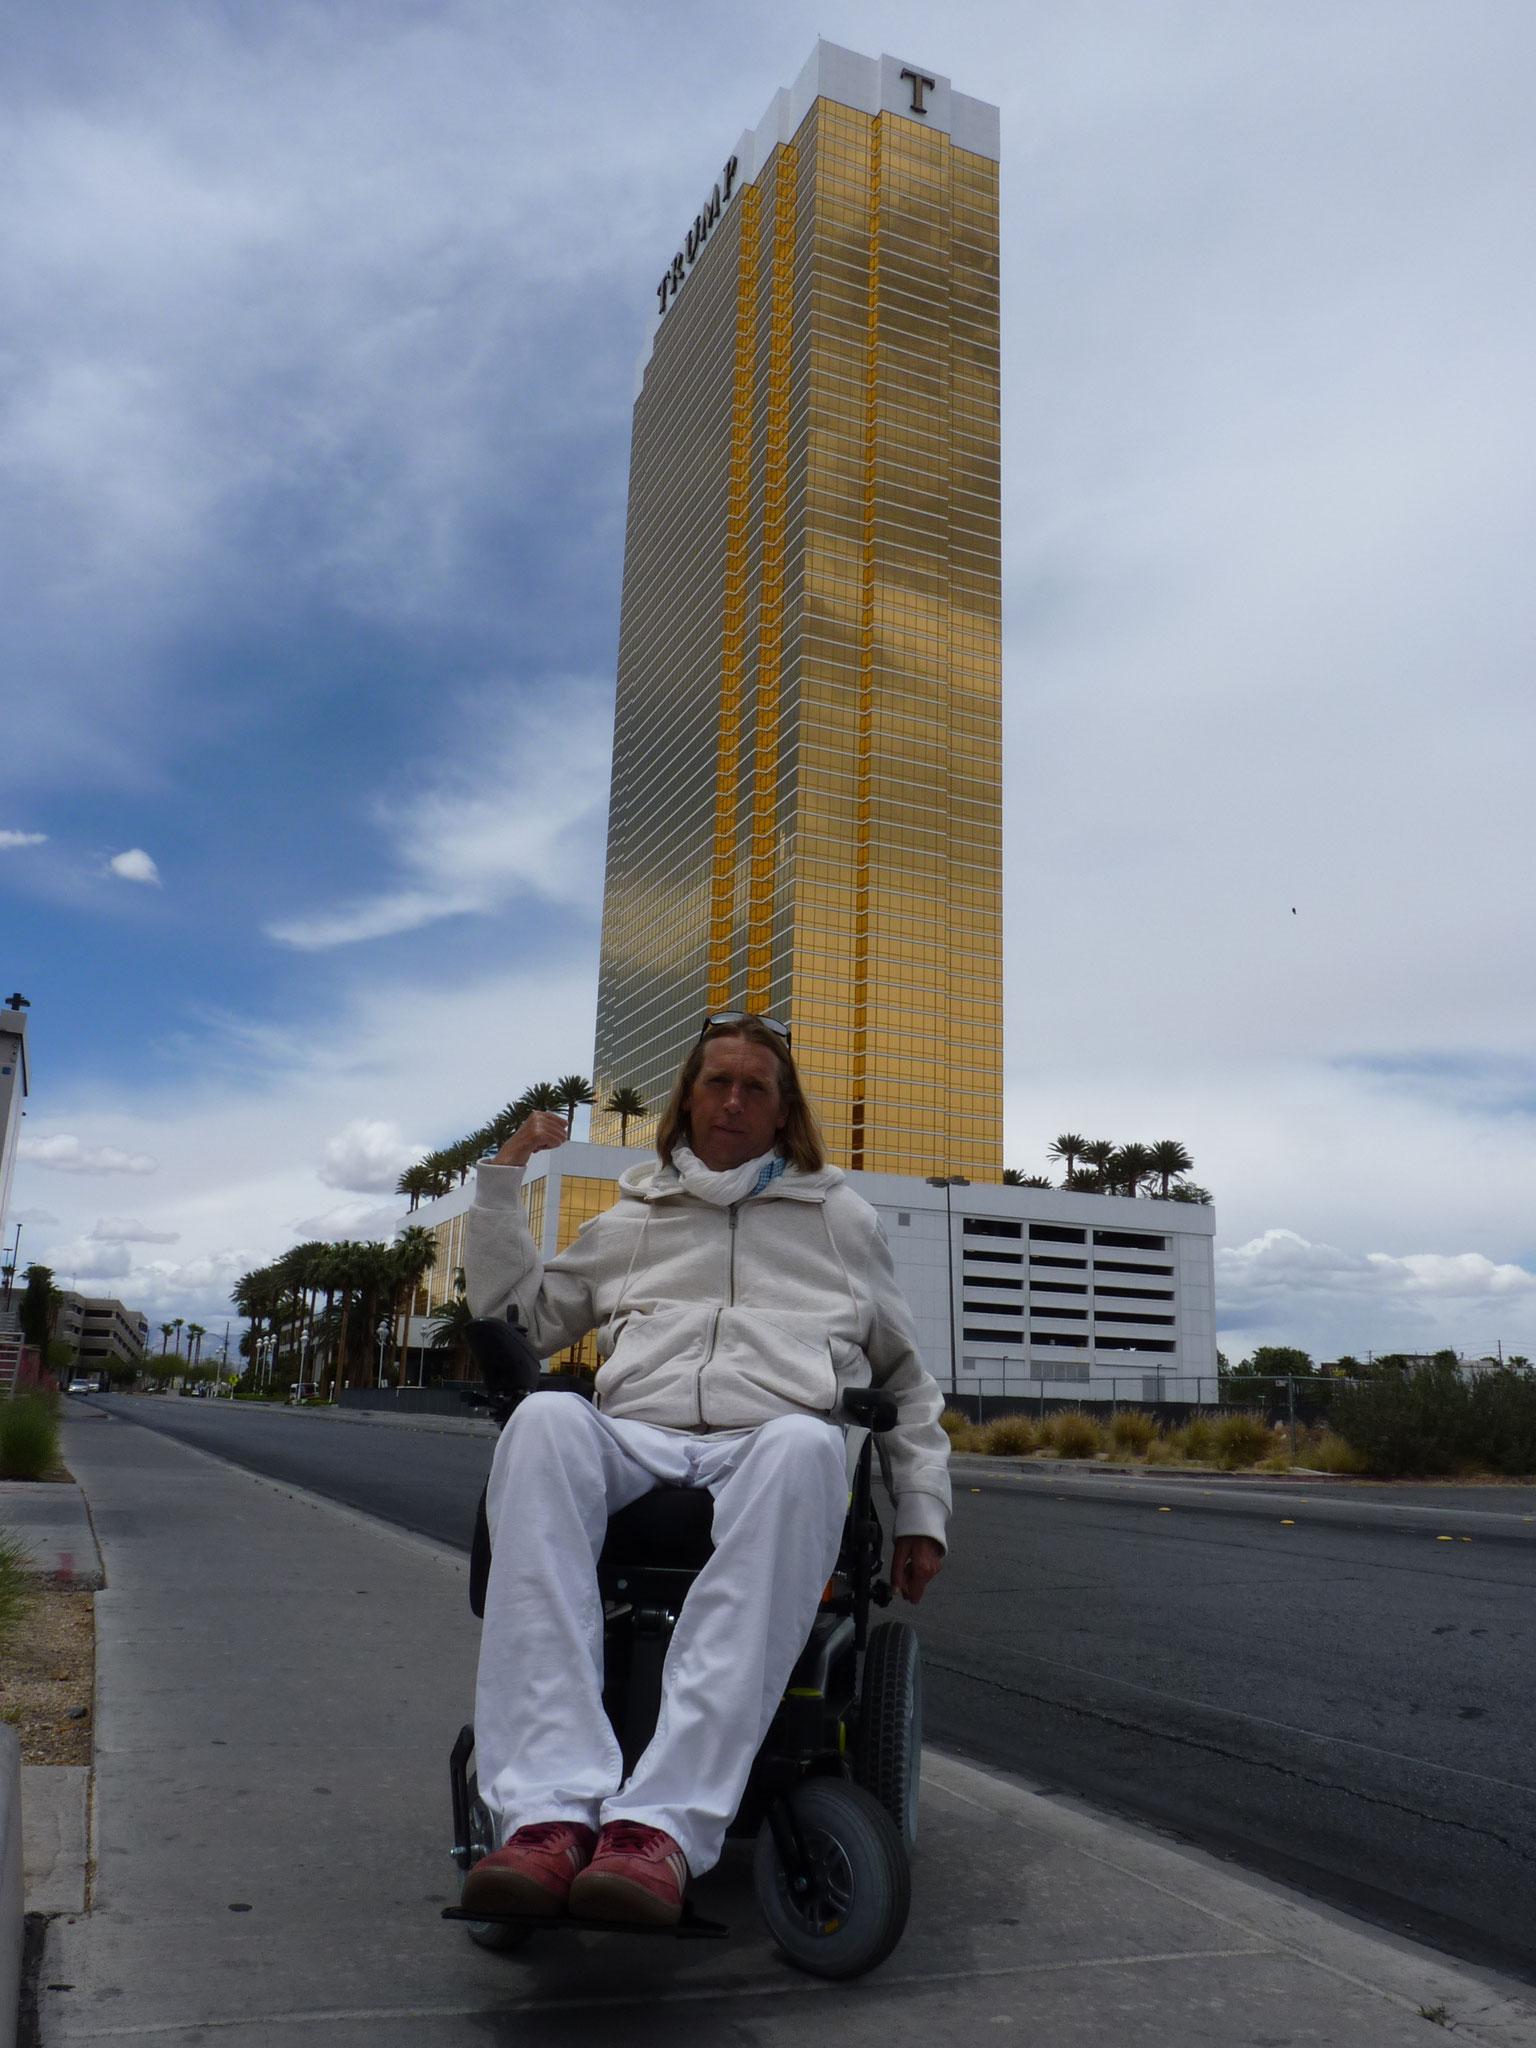 Devant le Trump Hotel de Vegas